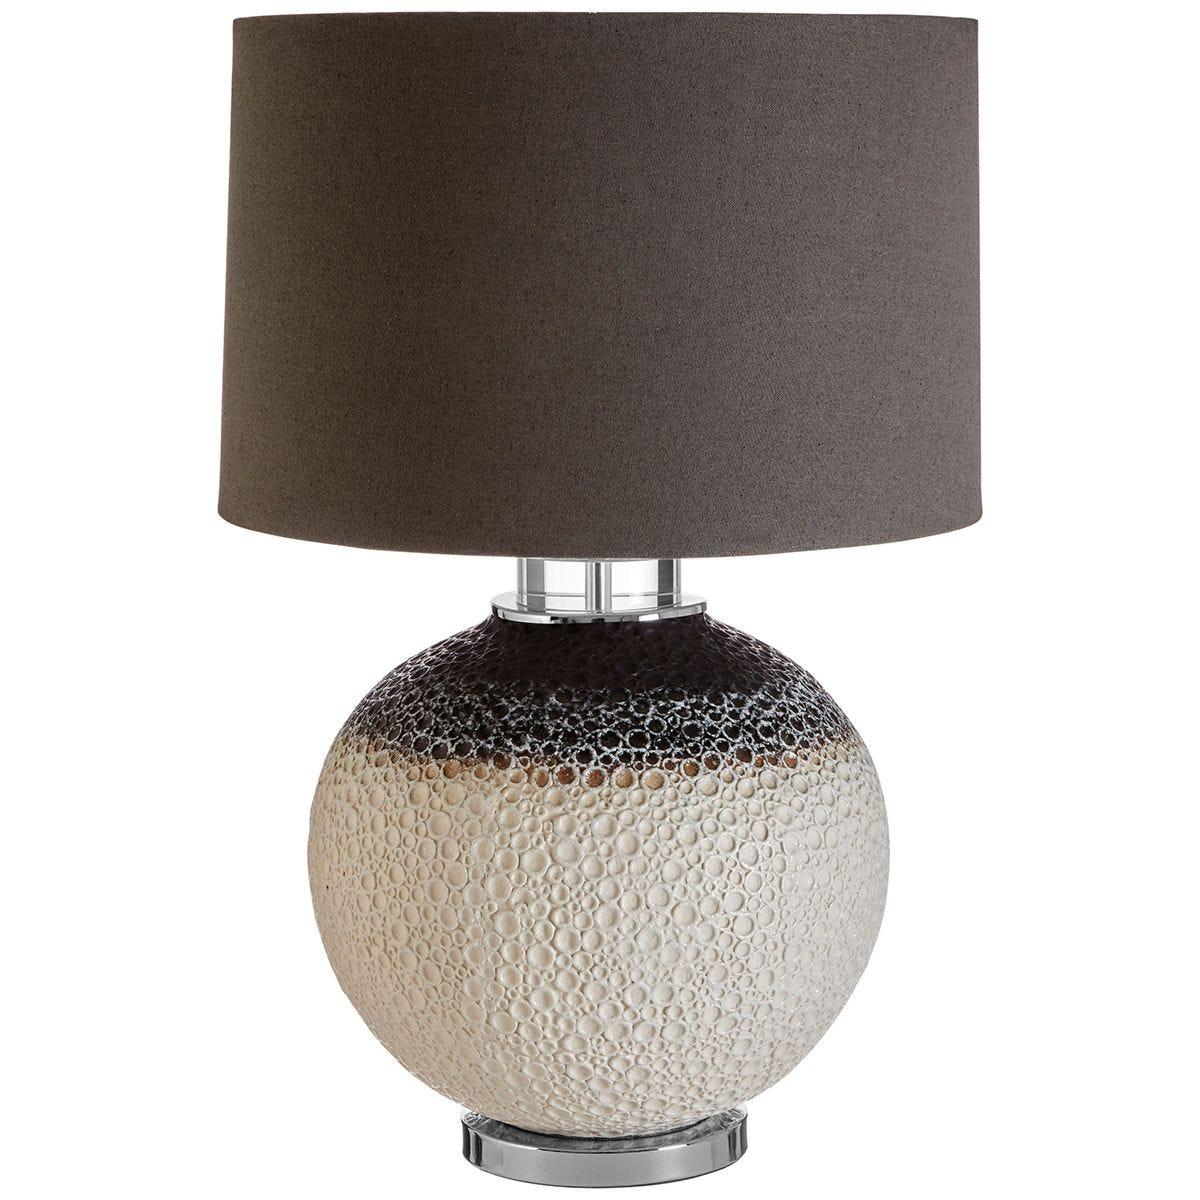 Premier Housewares Uli Table Lamp with Dark Grey Shade